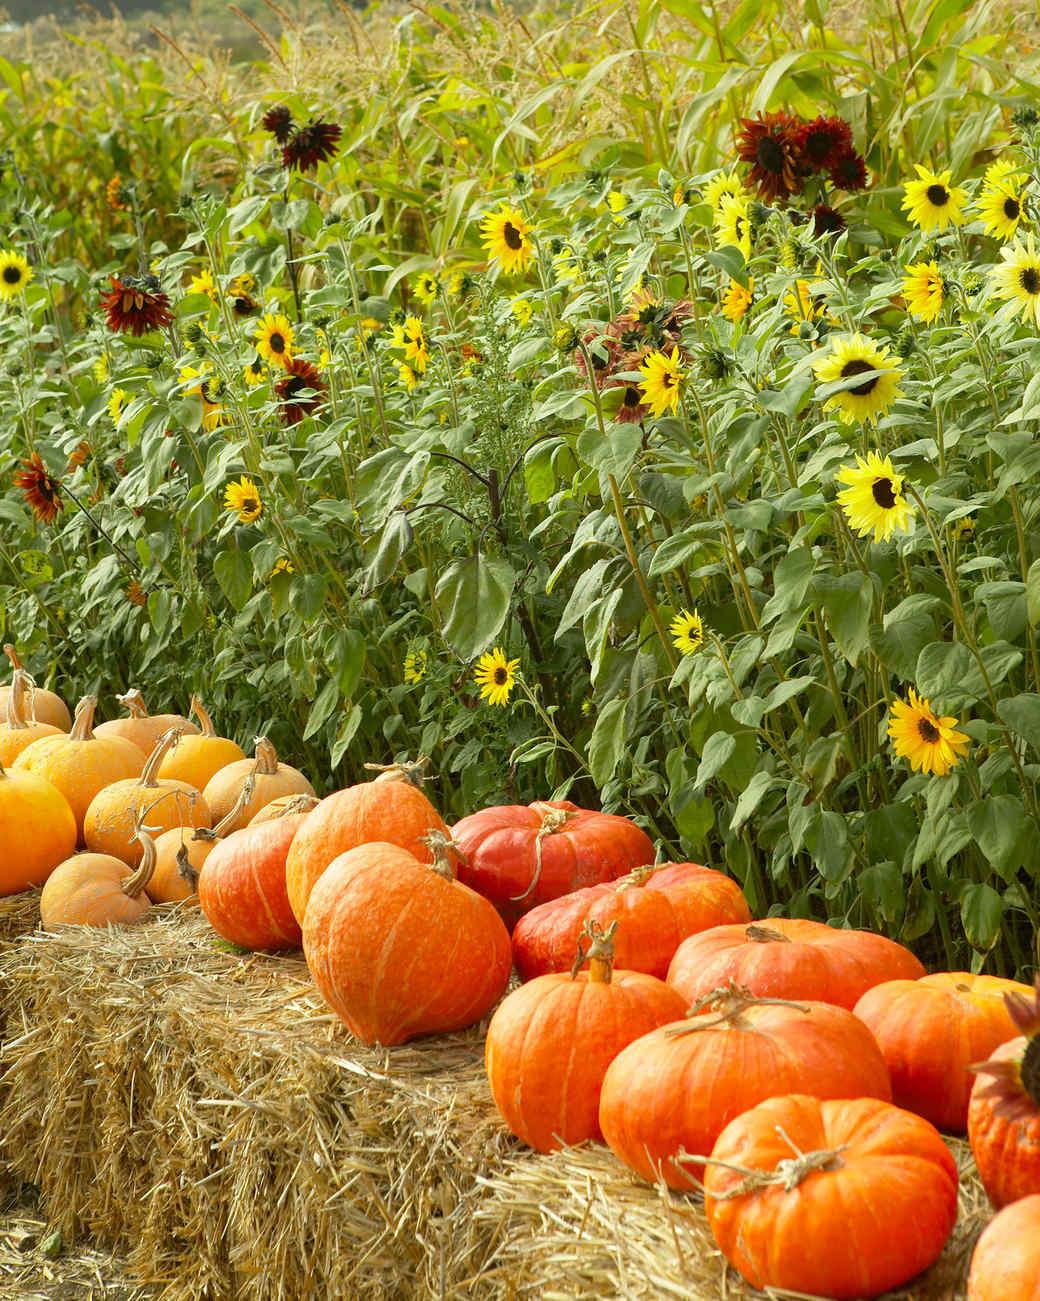 pumpkins placed on hay bales along flower field